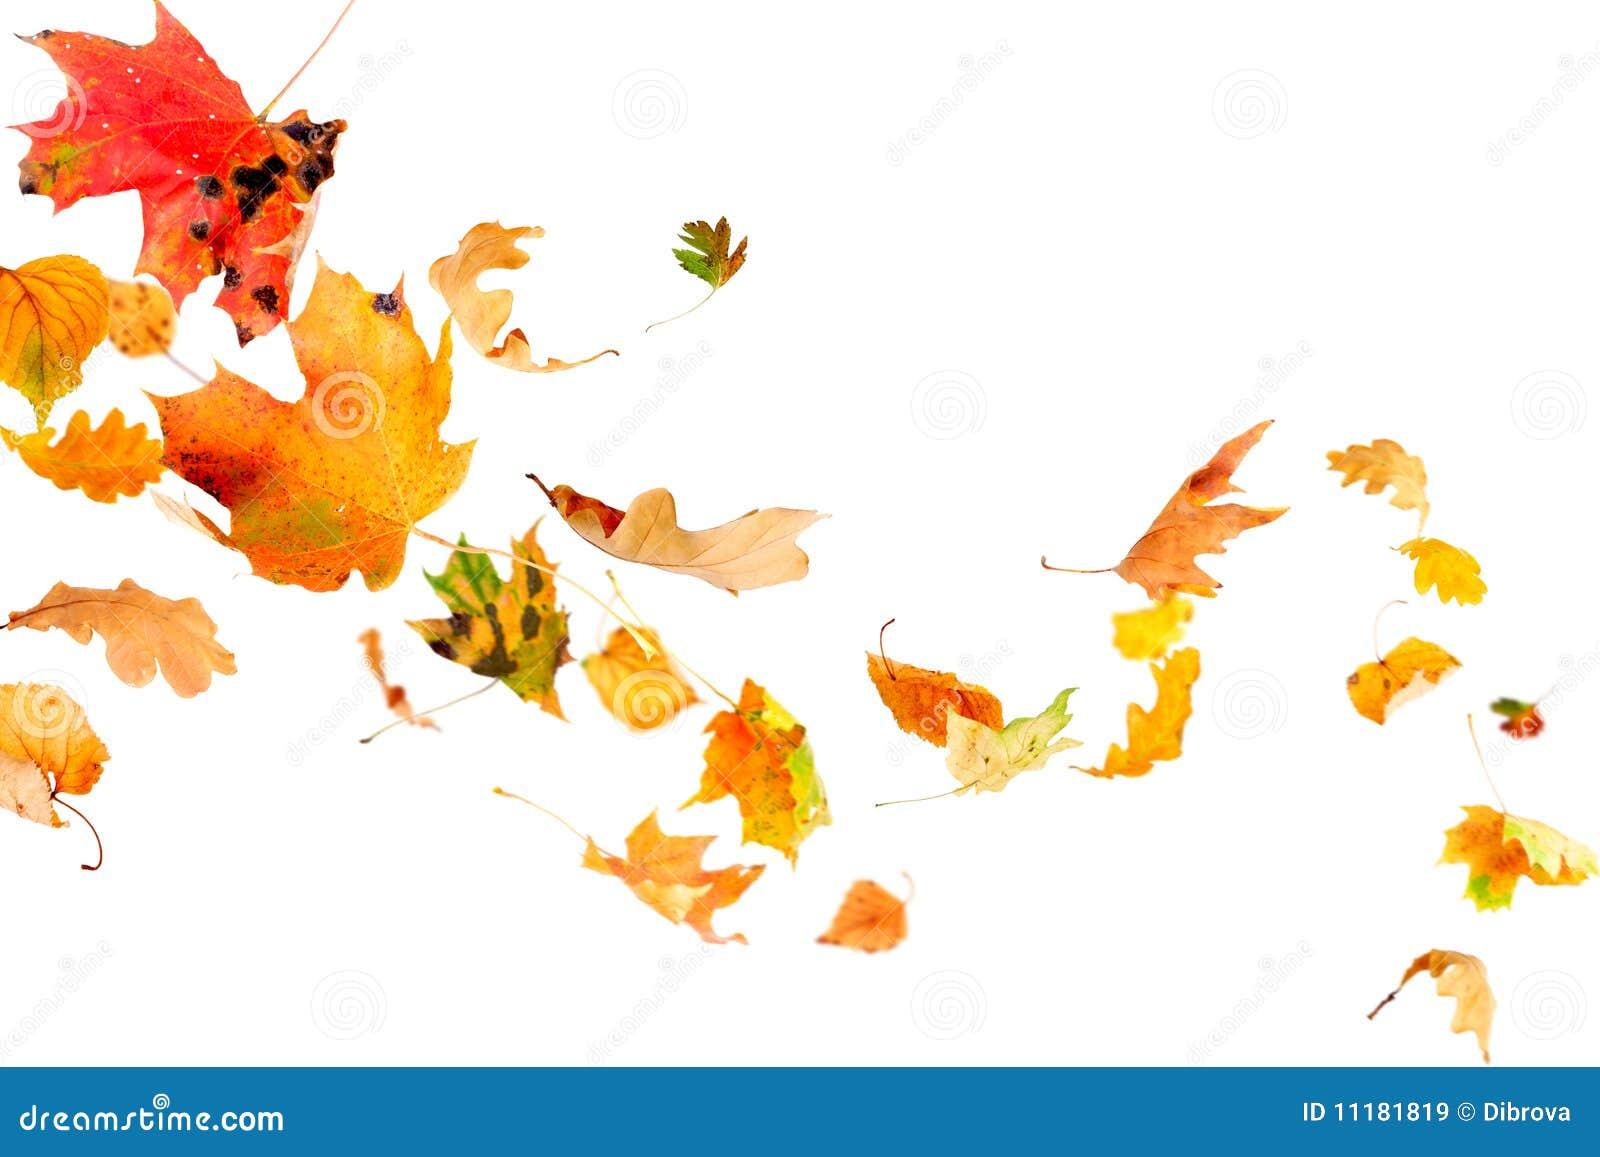 falling autumn leaves royalty free stock images image oak leaf acorn clipart oak leaf clip art borders